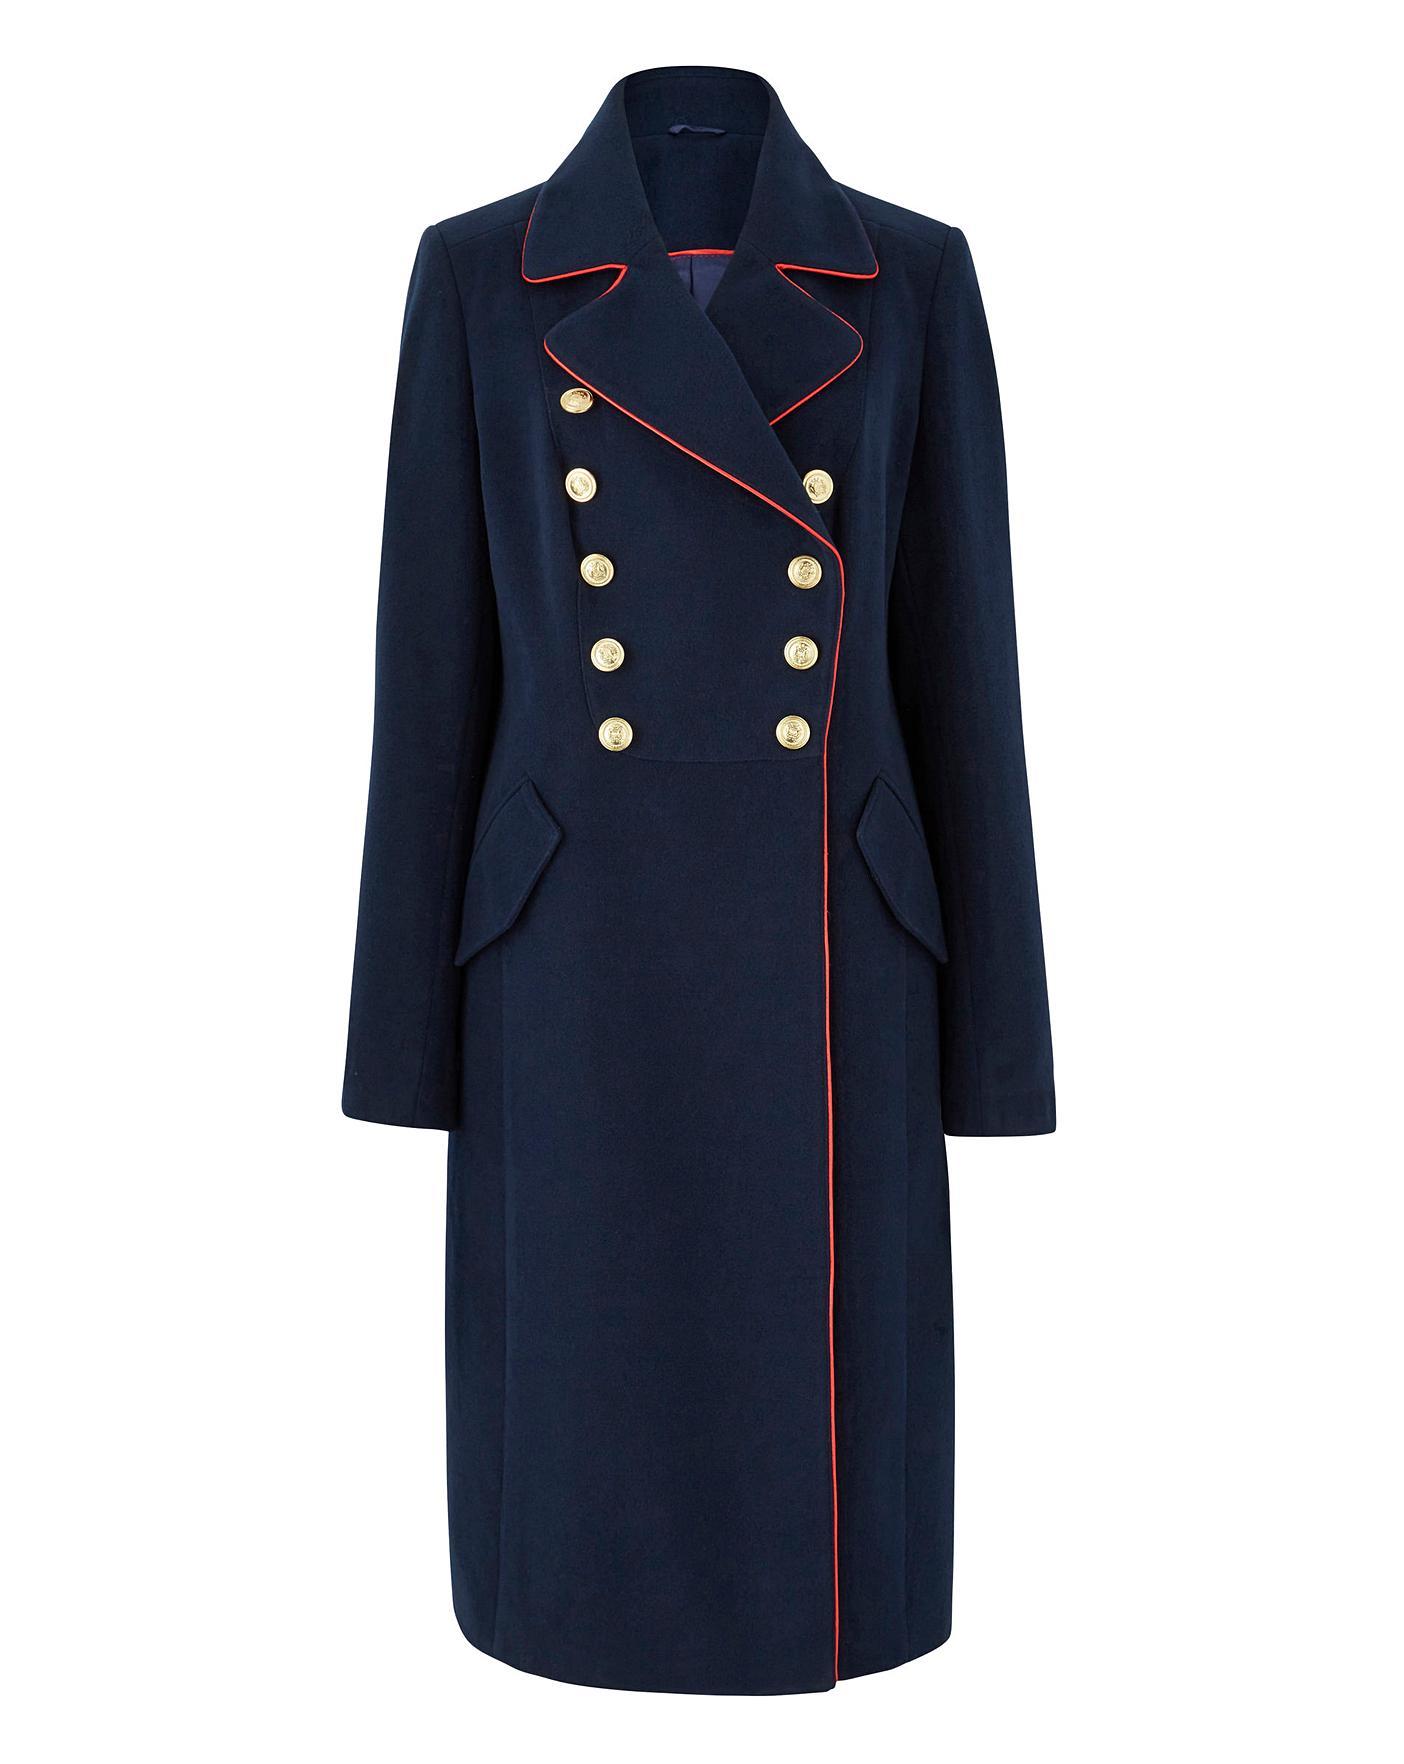 Joanna Hope Military Coat